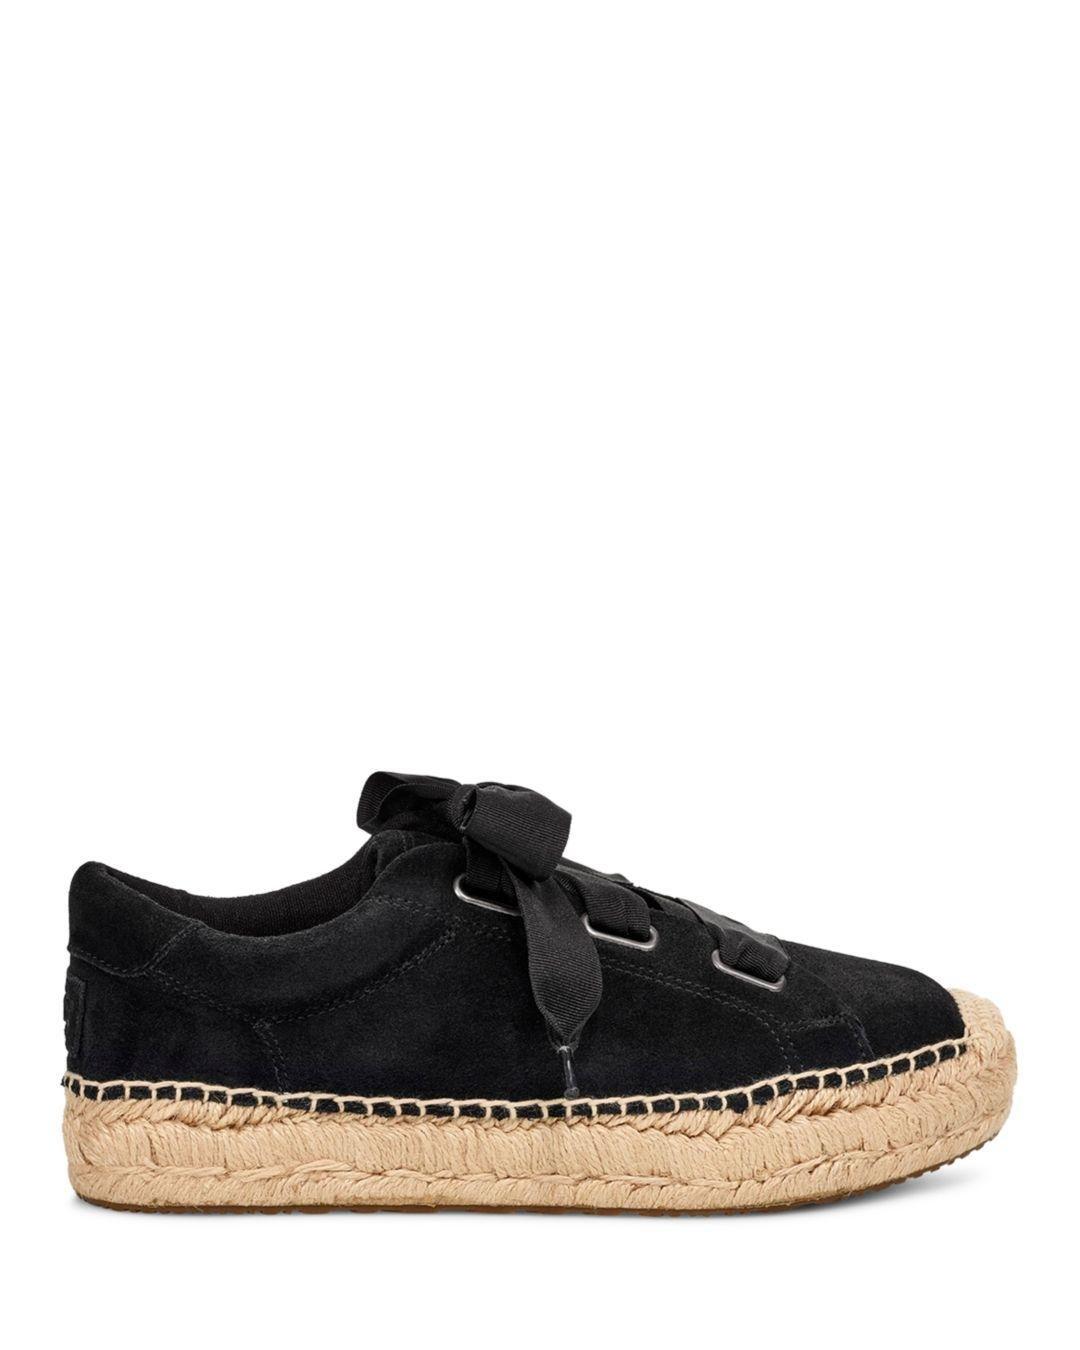 6c0c1aaa63aa ugg-Black-Womens-Brianna-Suede-Espadrille-Sneakers.jpeg